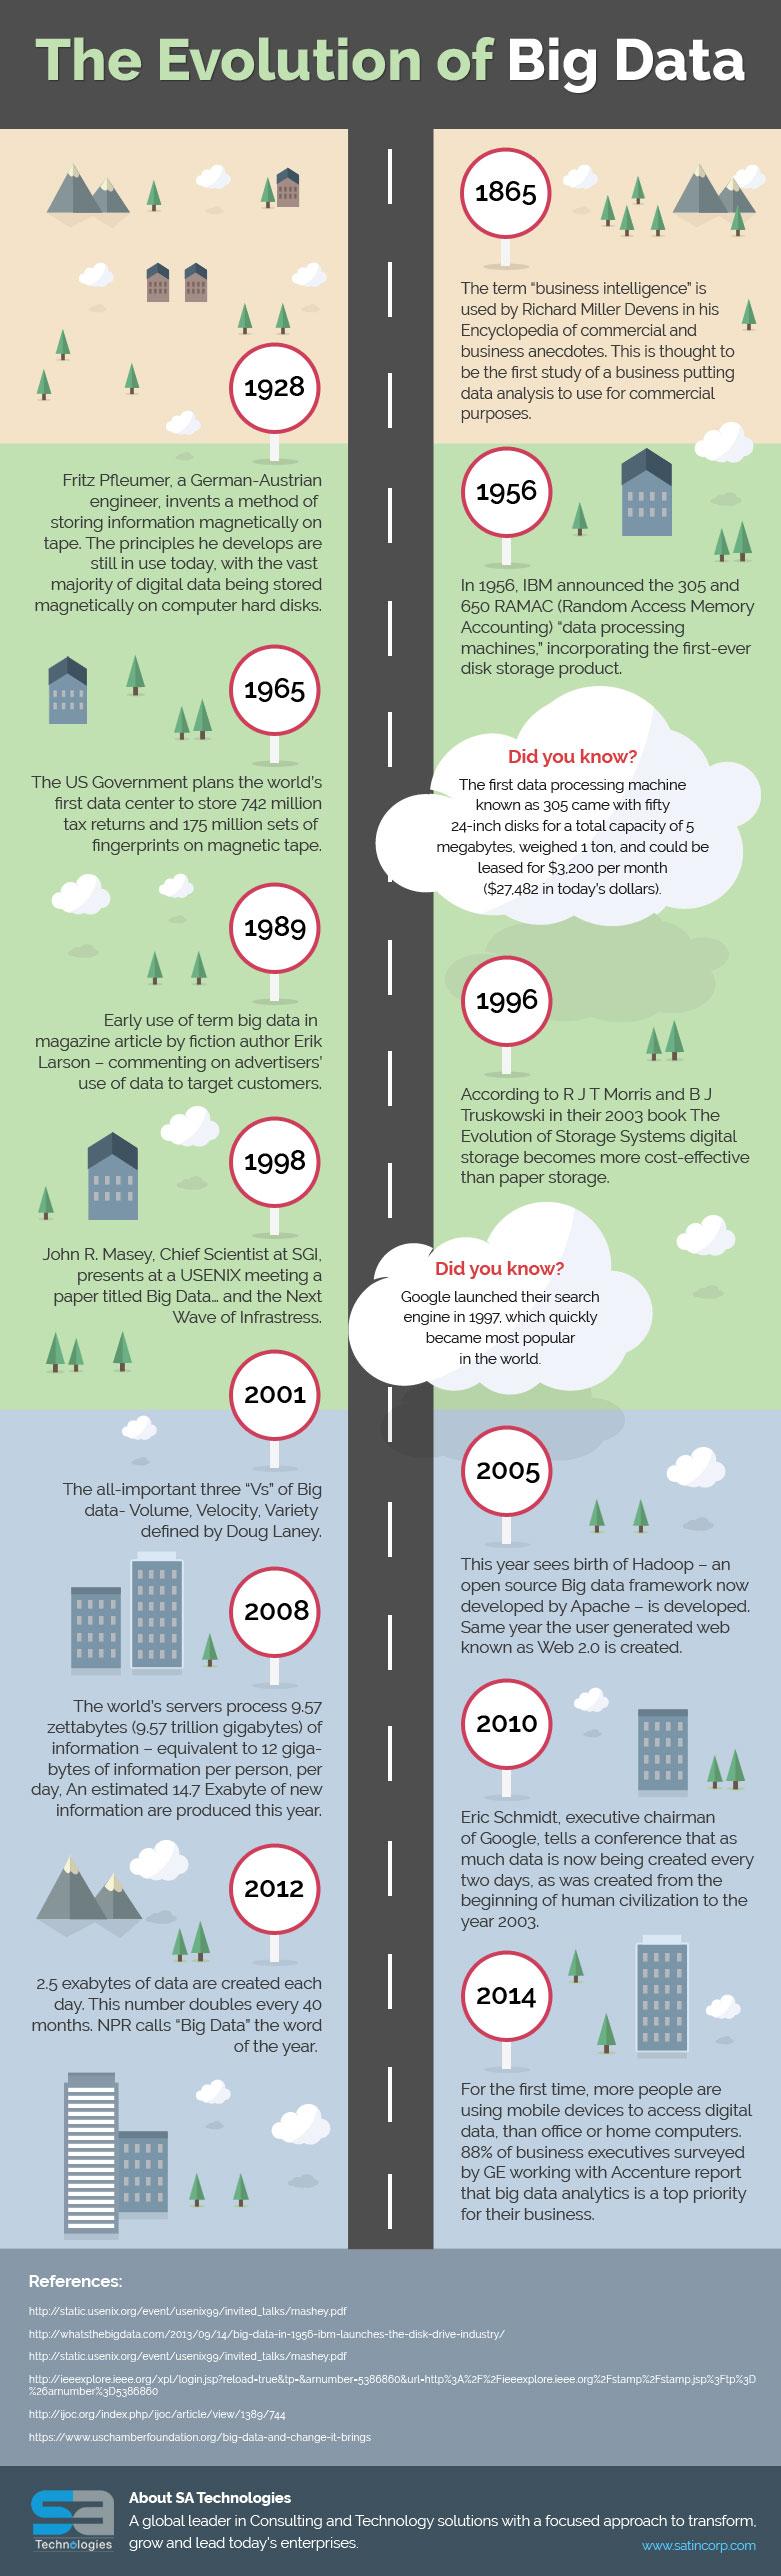 The Evolution of Big Data - Image 1